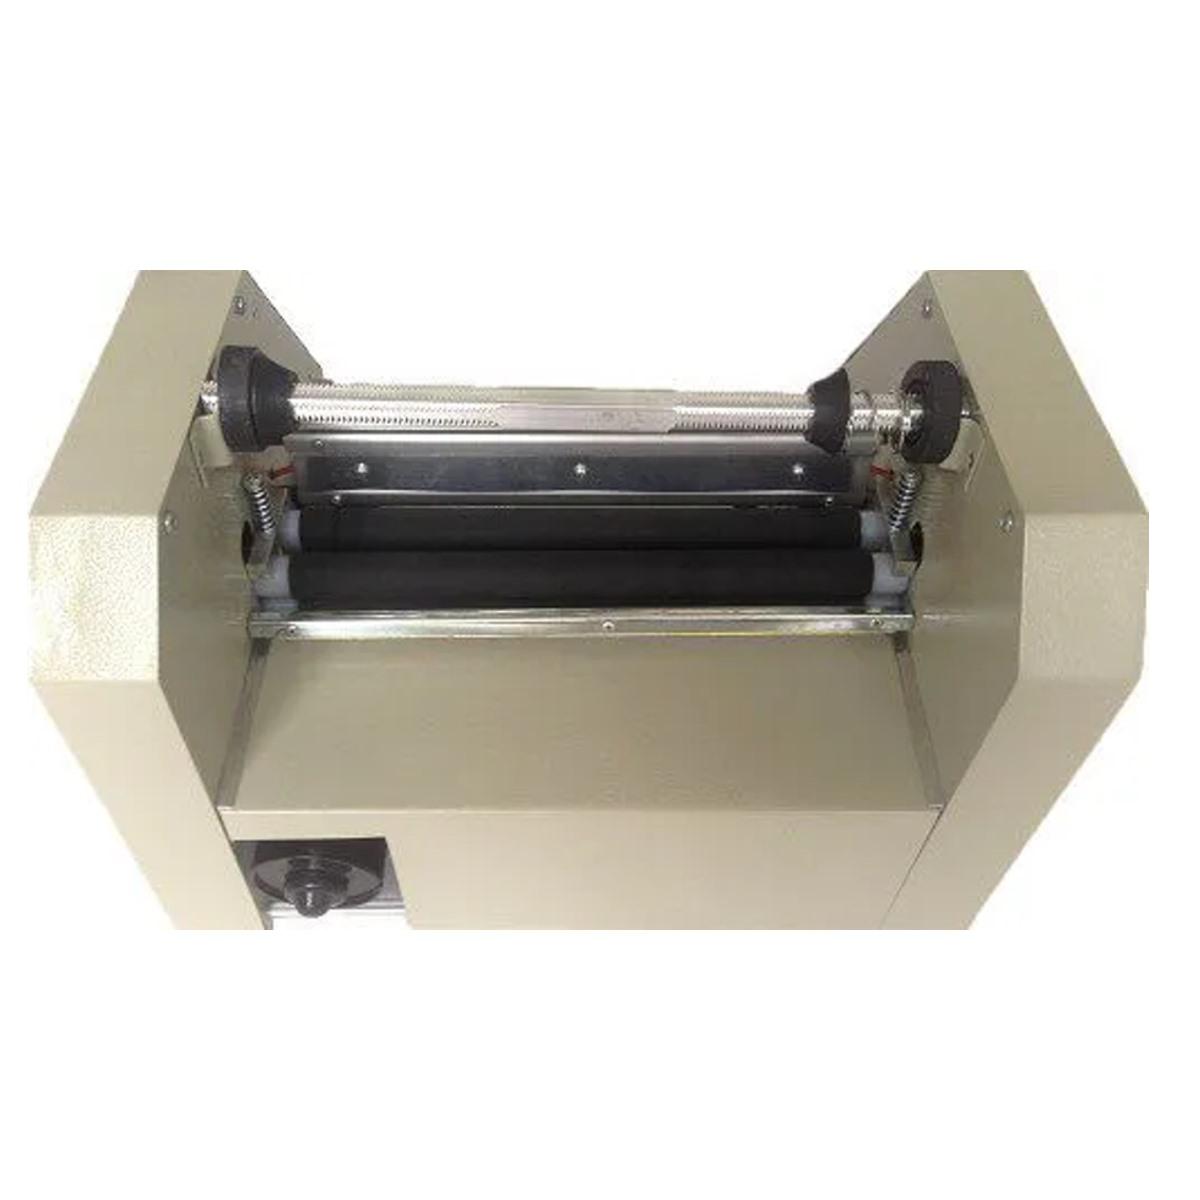 Plastificadora Profissional Rotativa de Bobina A3 Bi-volt R380